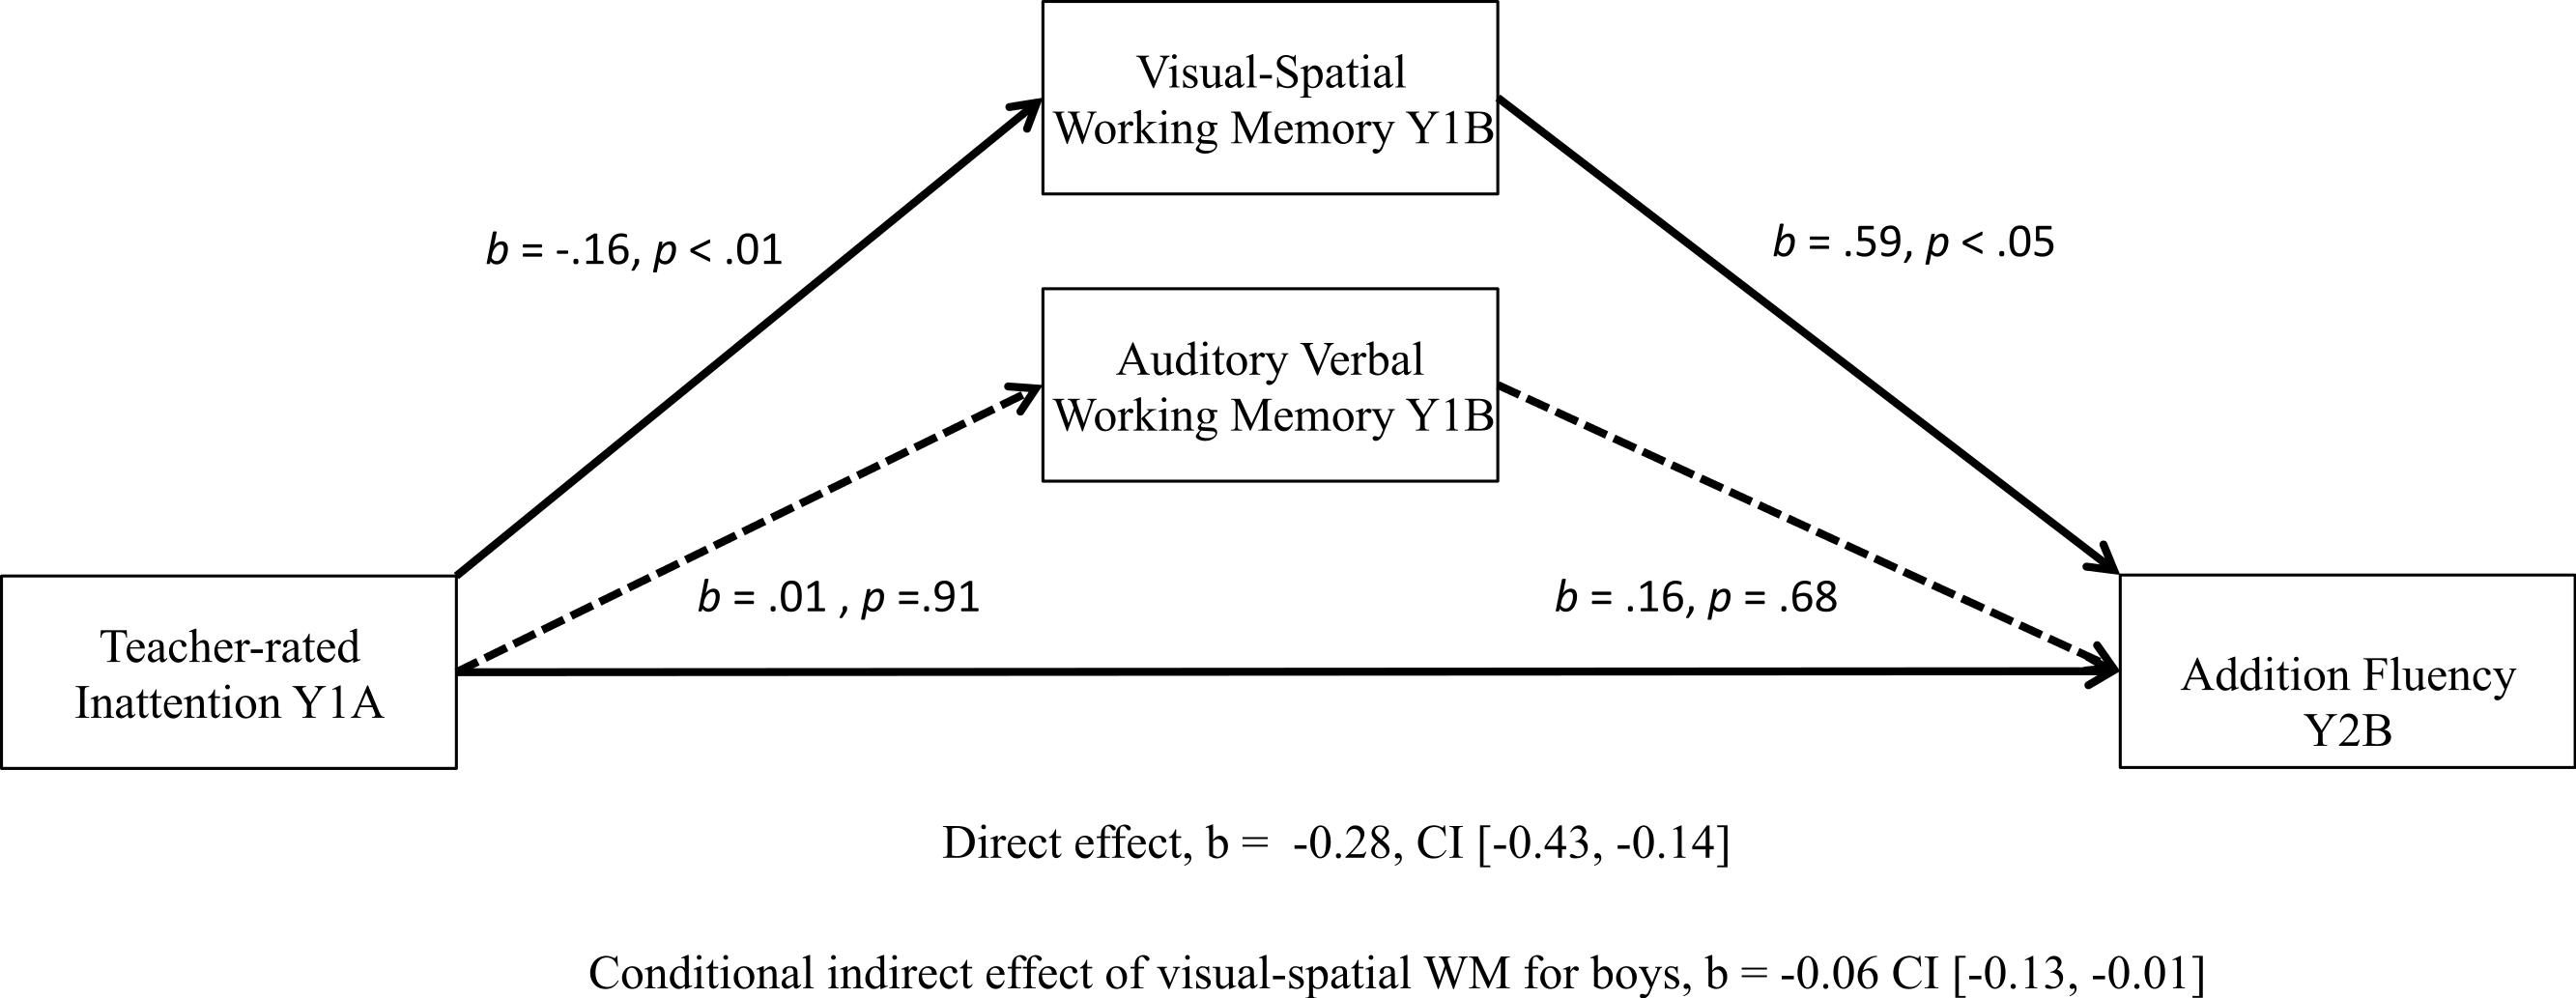 Longitudinal relations among inattention, working memory